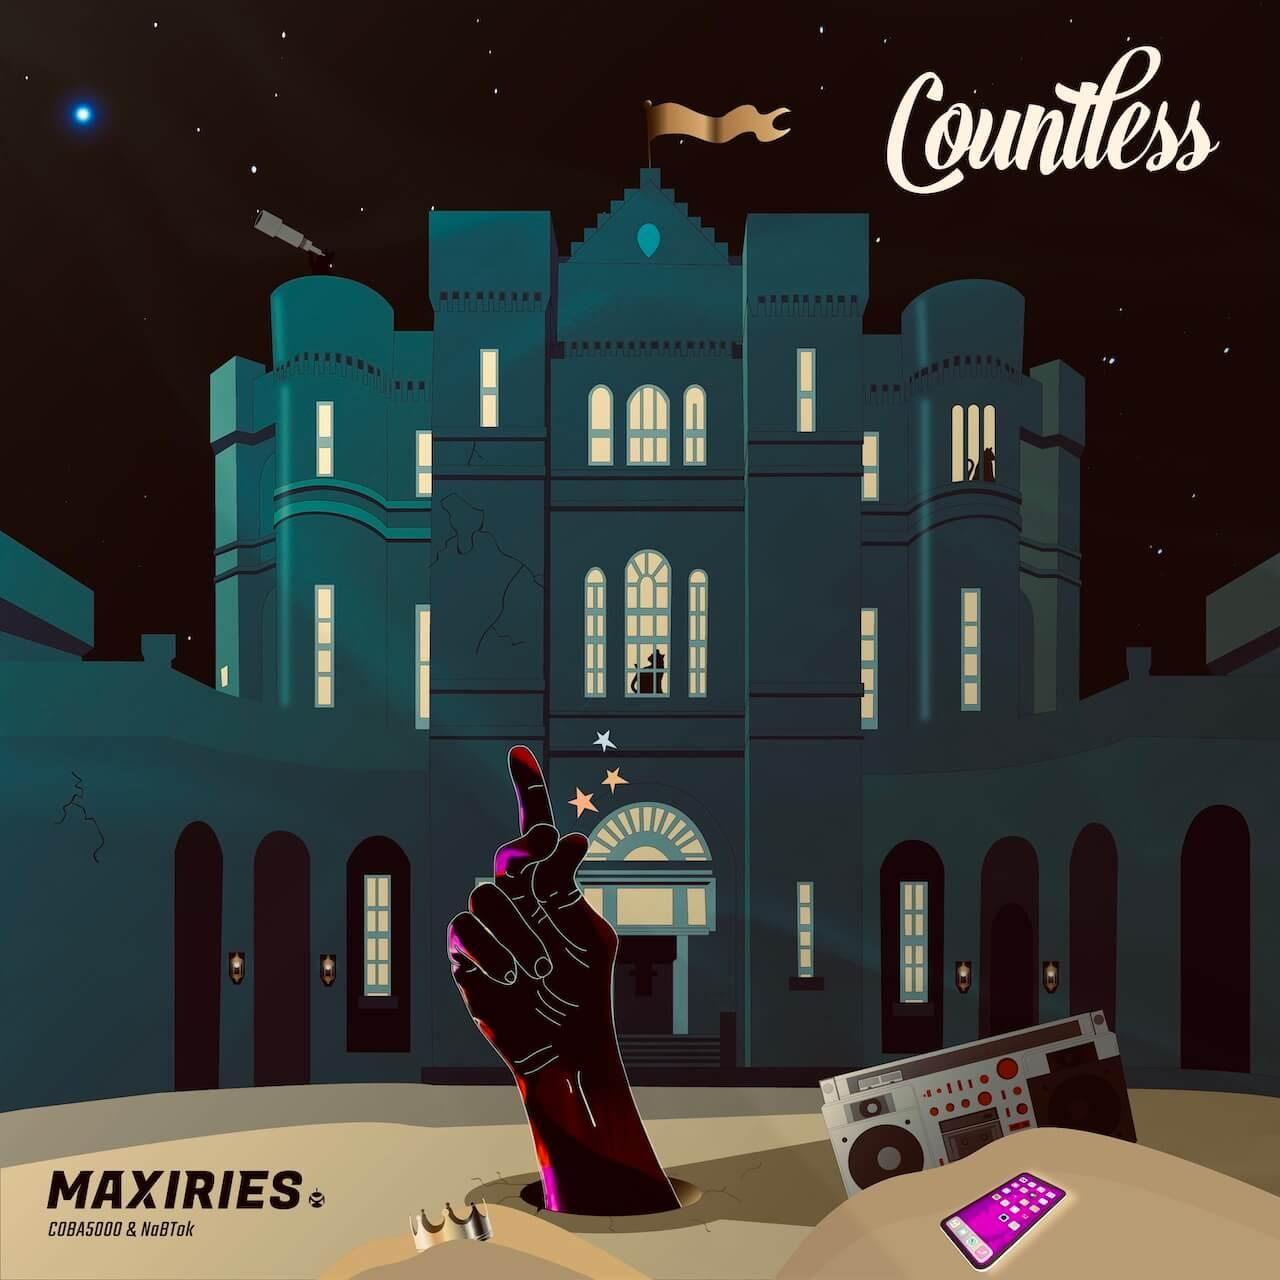 WAQWADOMなどの活動で知られるCOBA5000が初のソロEP『Countless』をリリース|NaBTokが全曲プロデュース music210225-coba5000-1